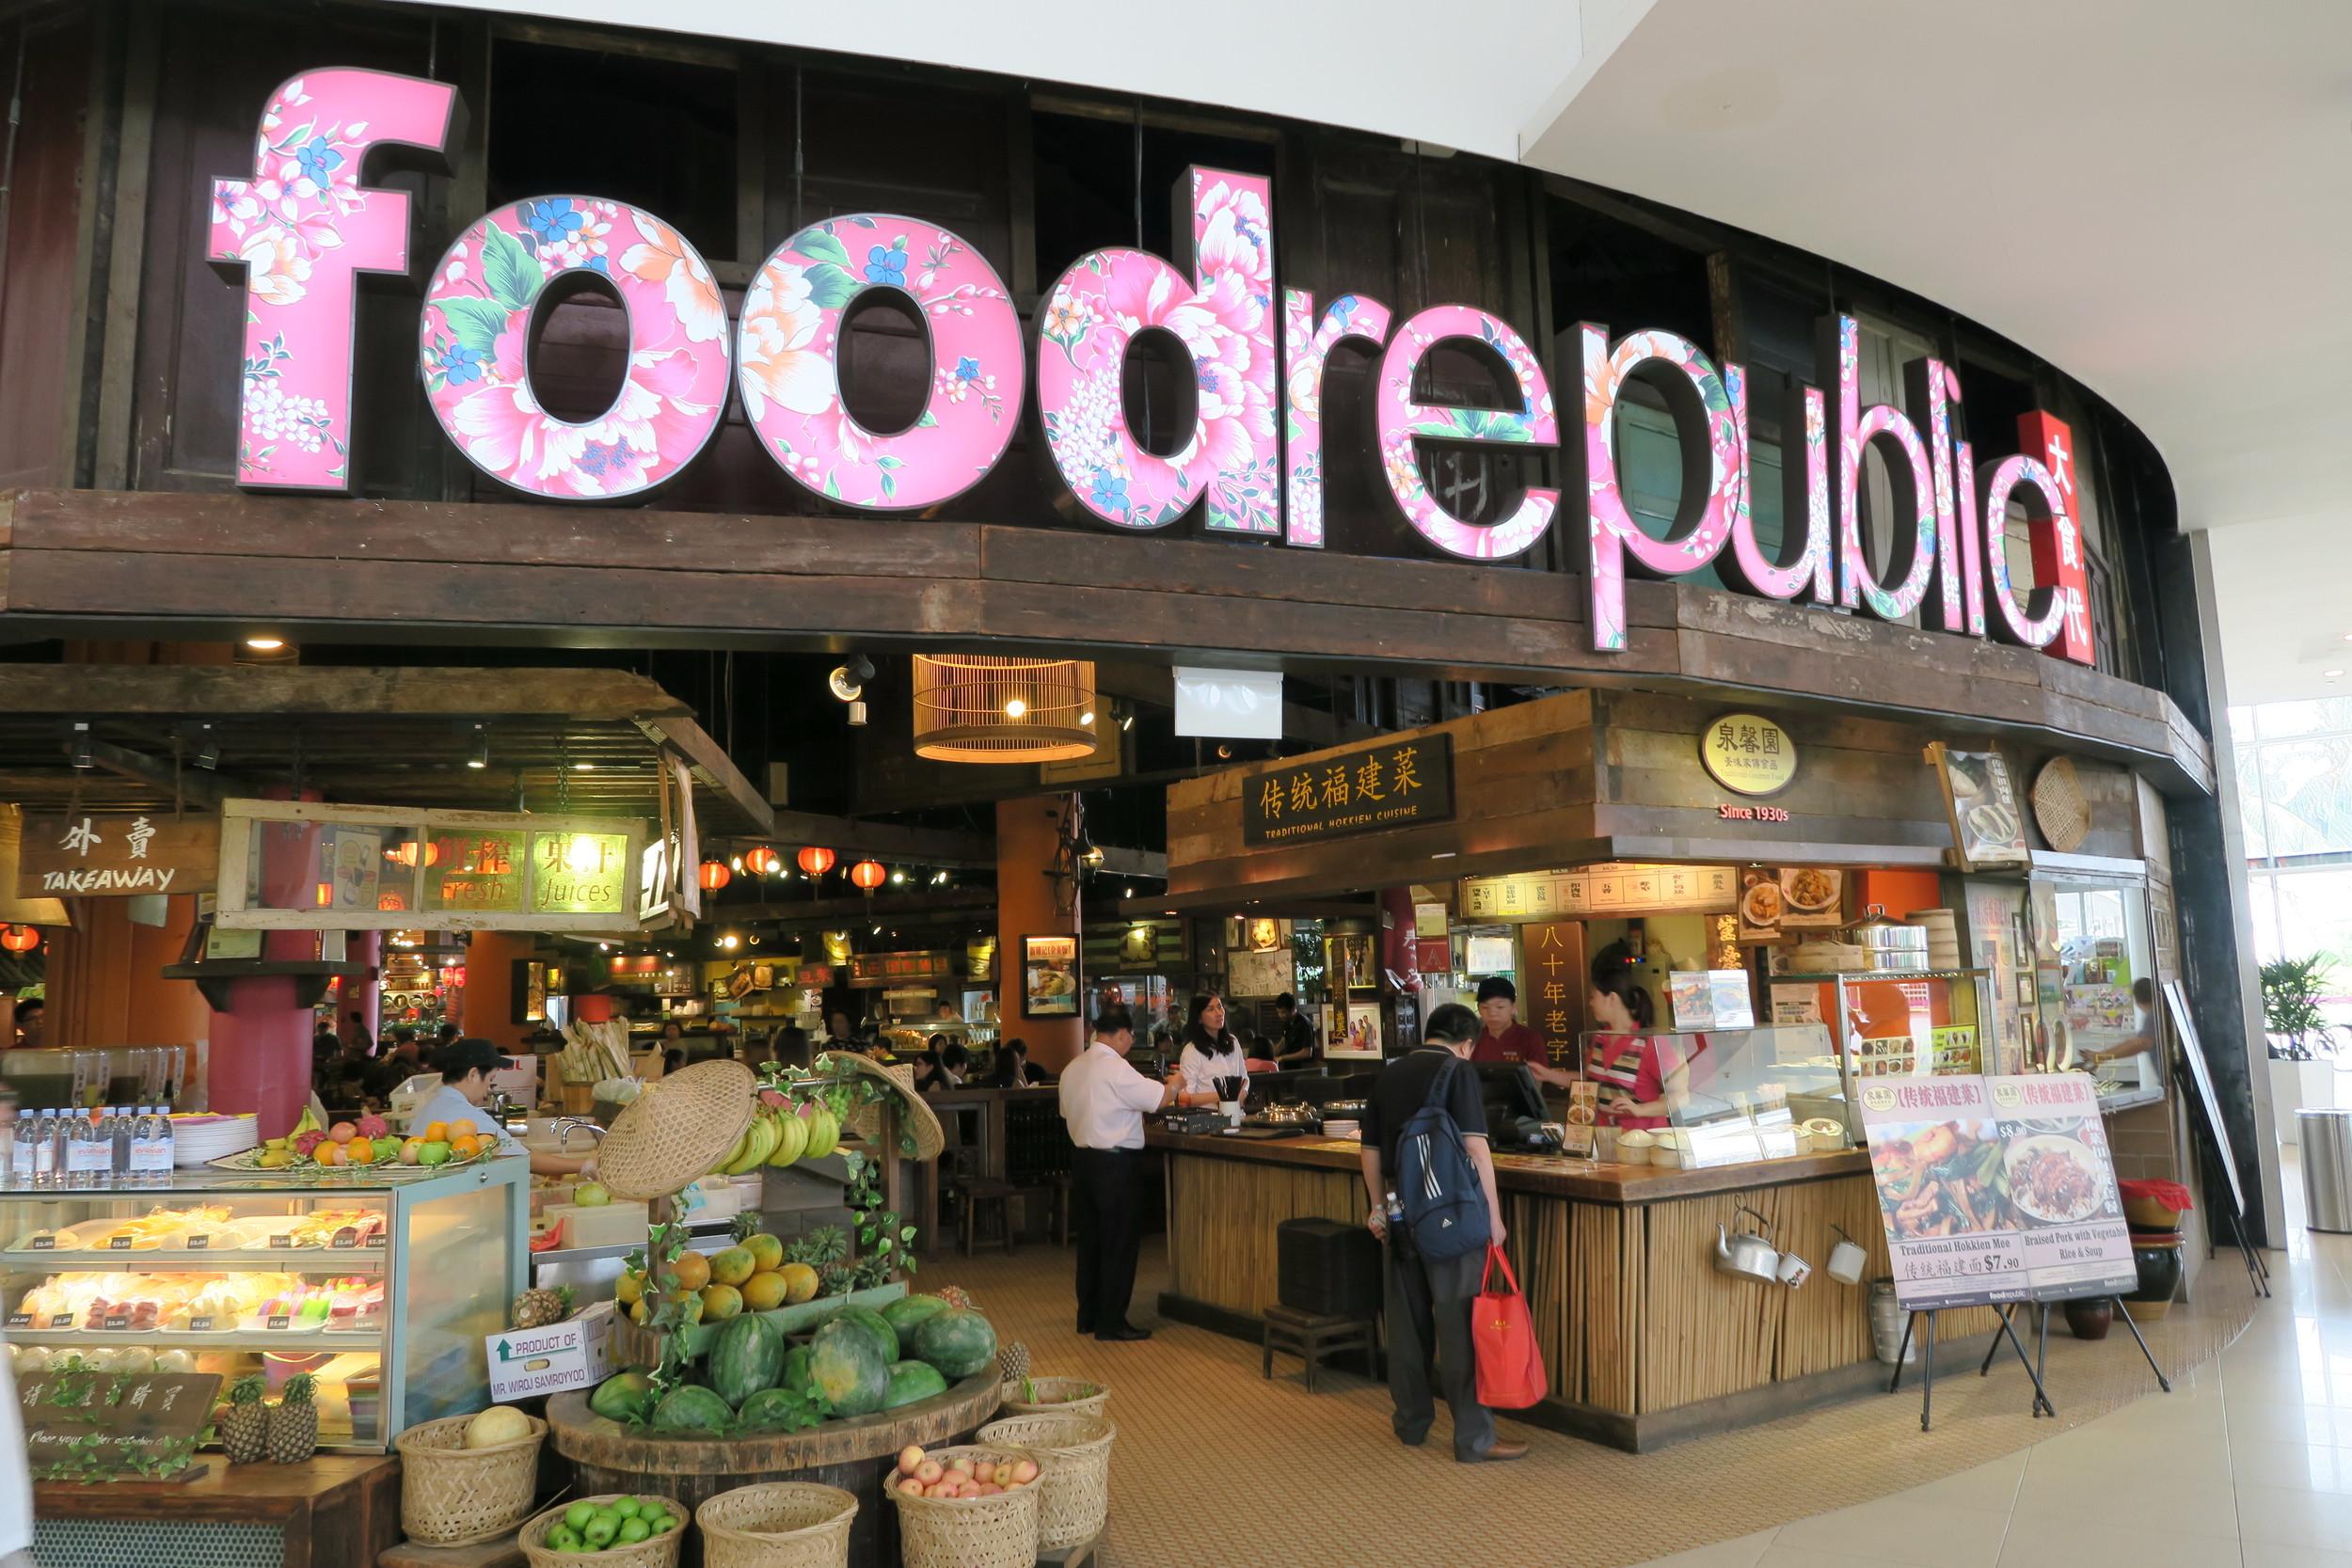 Food Republic in Vivo City SIngapore